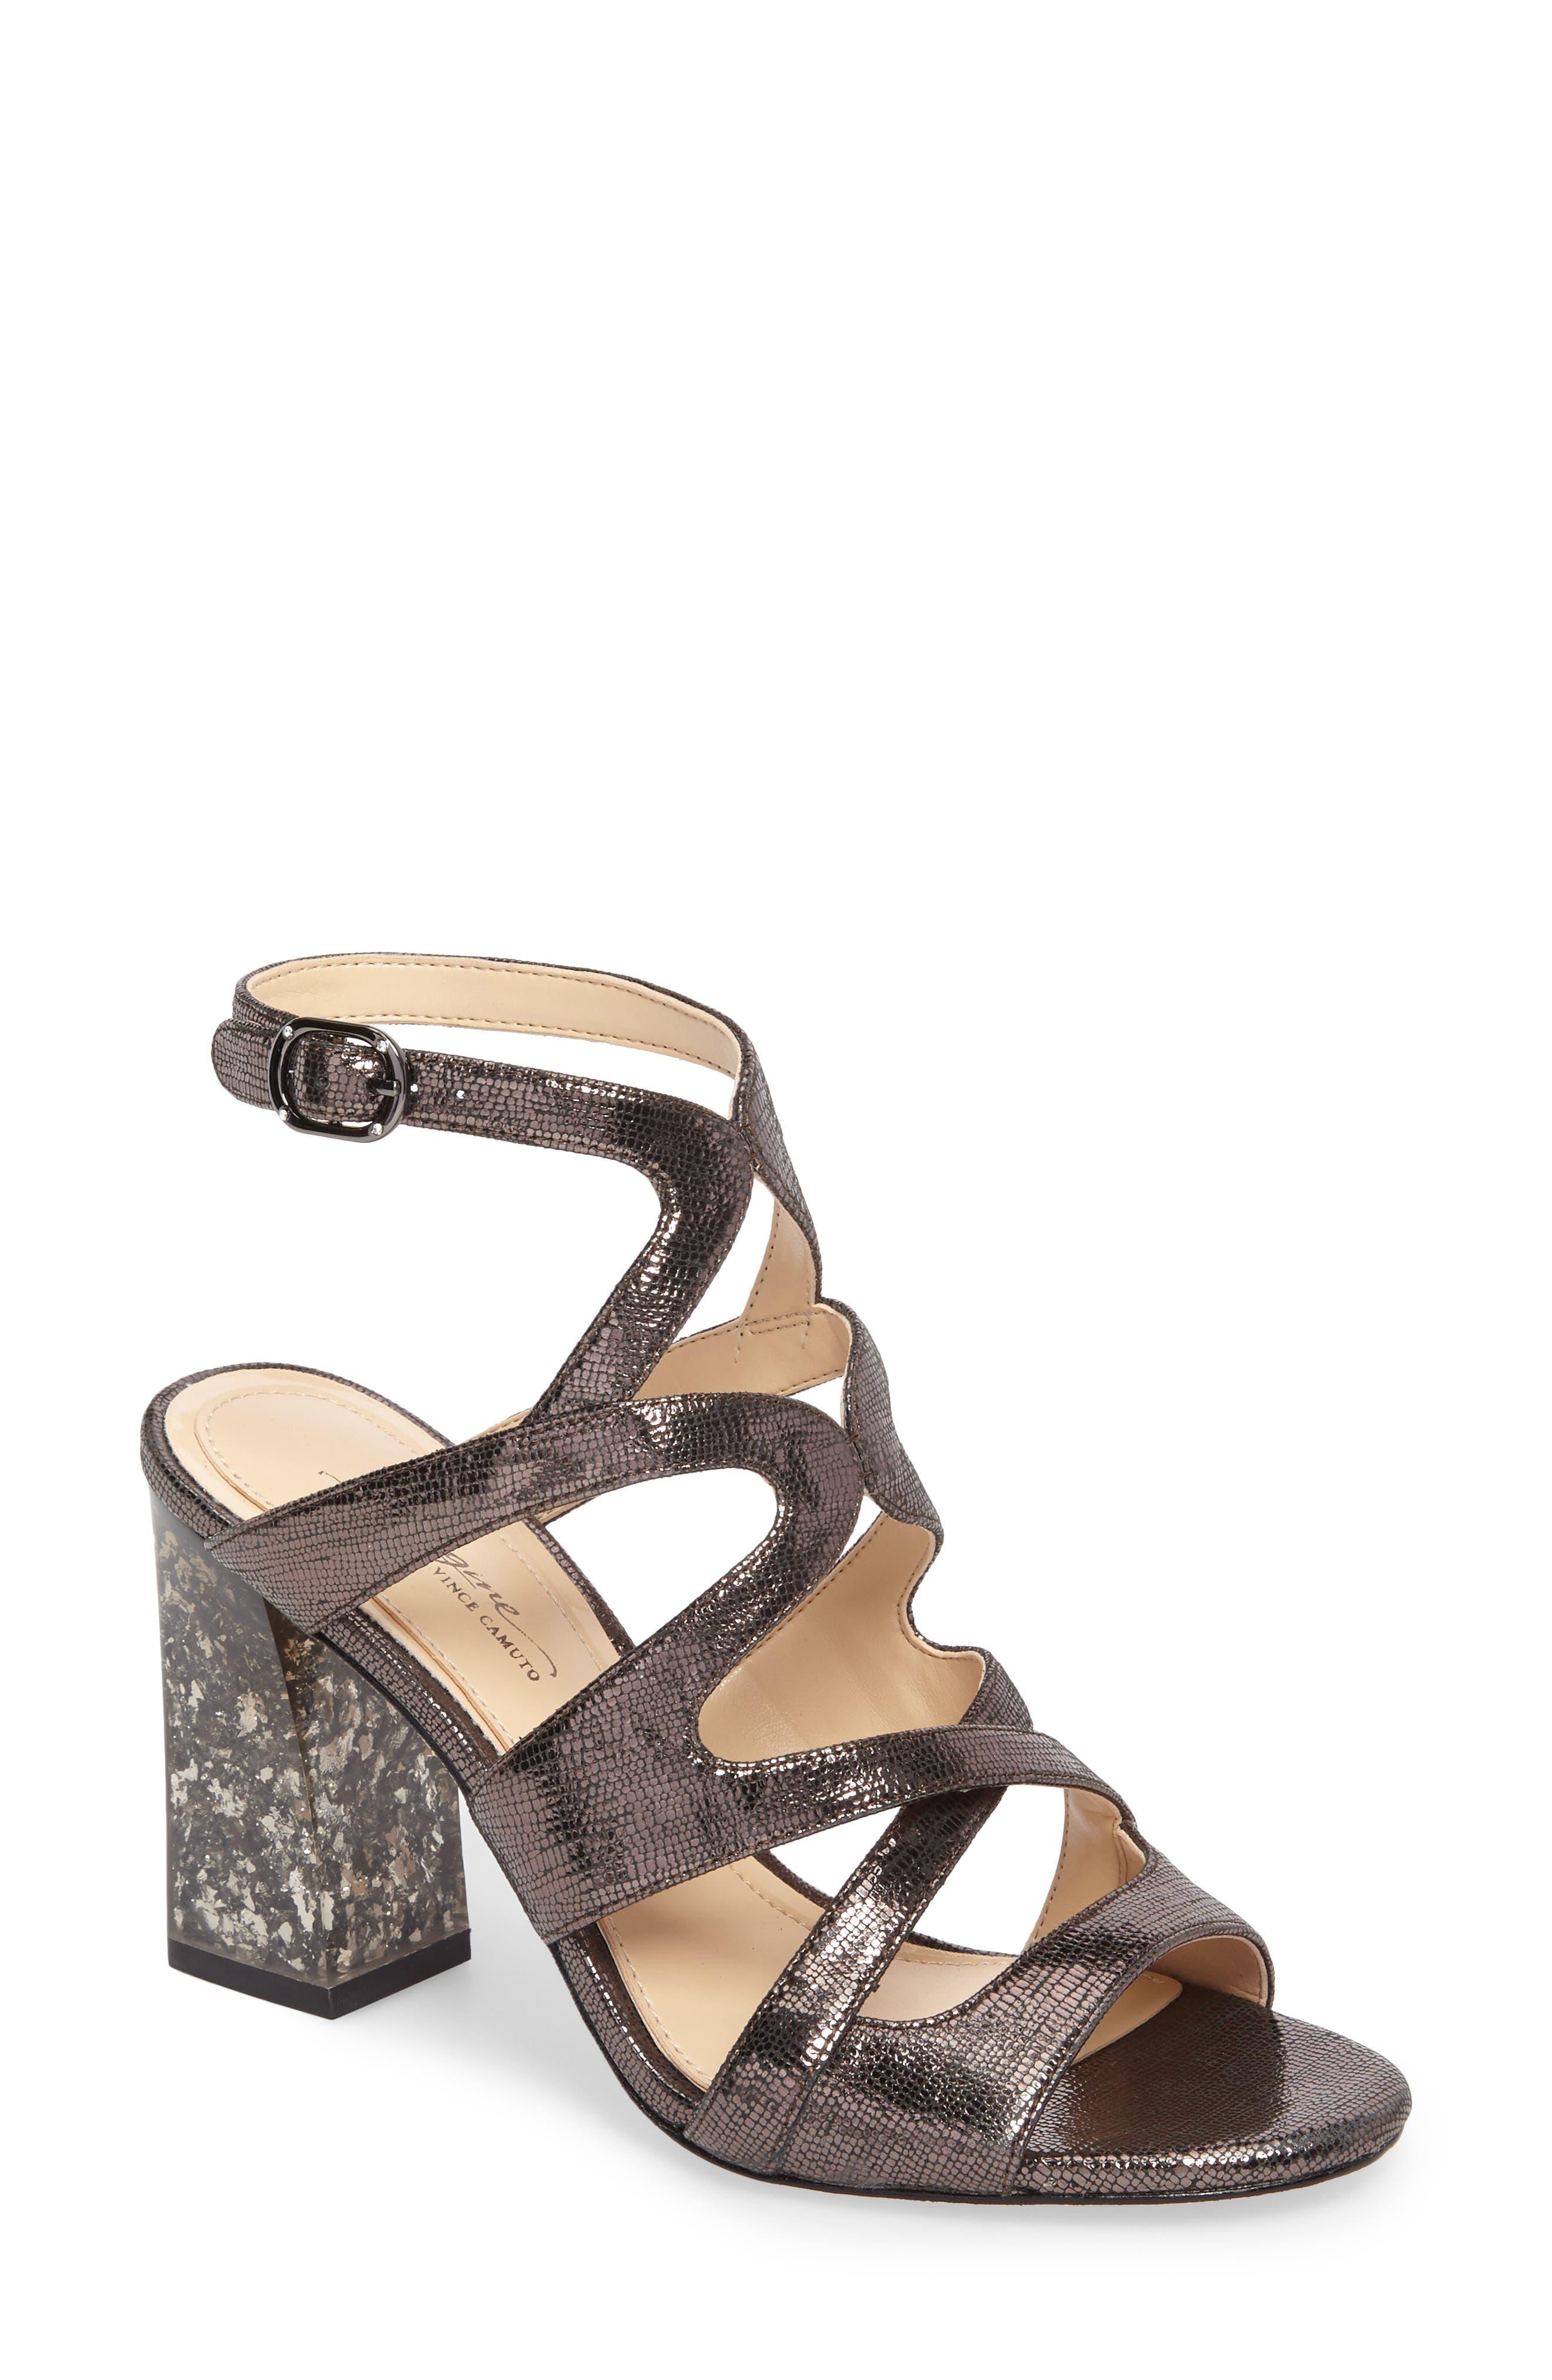 Imagine Vince Camuto Zahira Statement Heel Sandal (Women)